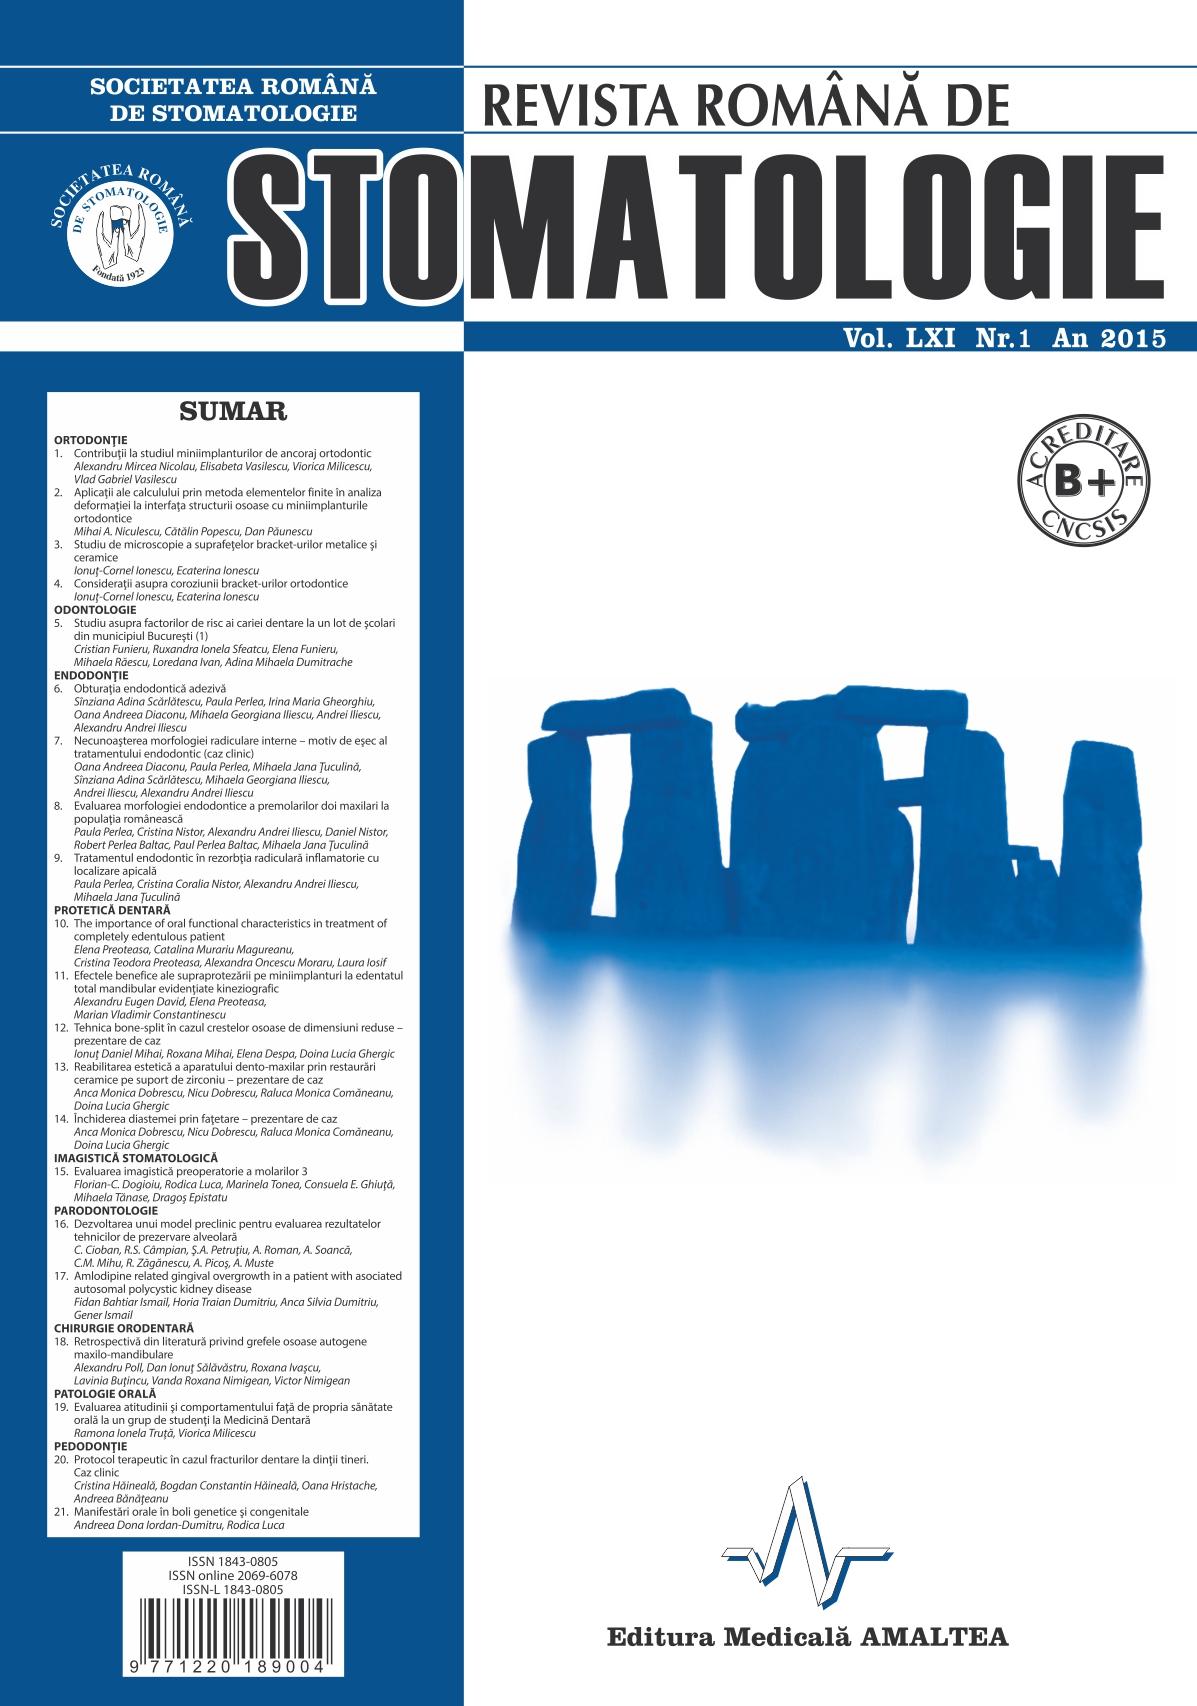 Revista Romana de STOMATOLOGIE - Romanian Journal of Stomatology, Vol. LXI, Nr. 1, An 2015